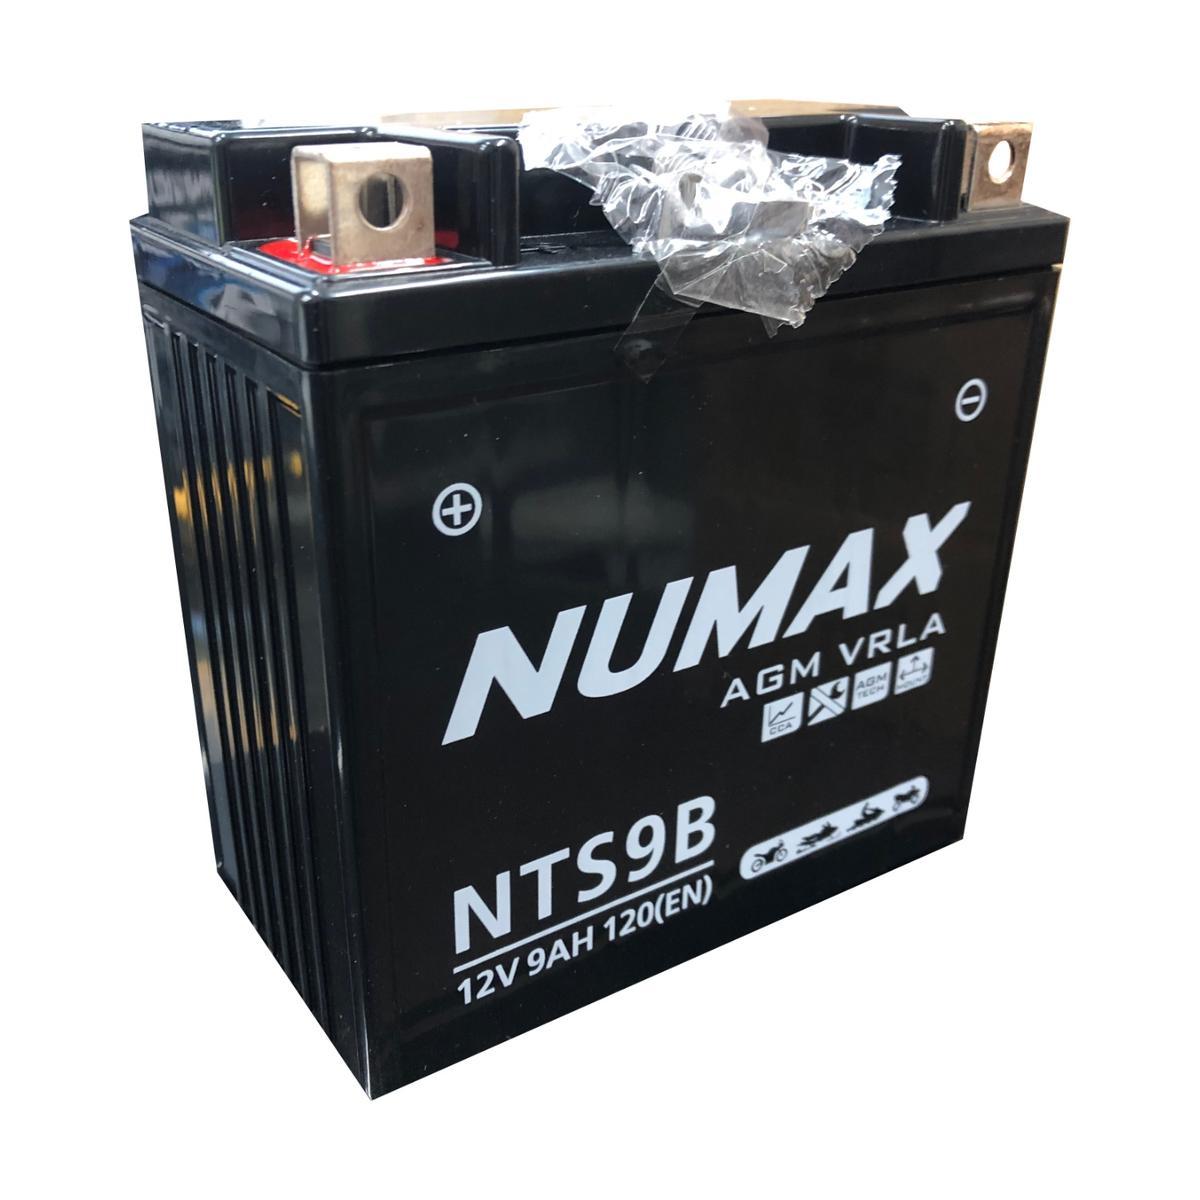 Numax NTS9B 12v Bike Motorbike Motorcycle Battery KAWASAKI 125cc BN125 YB9-B